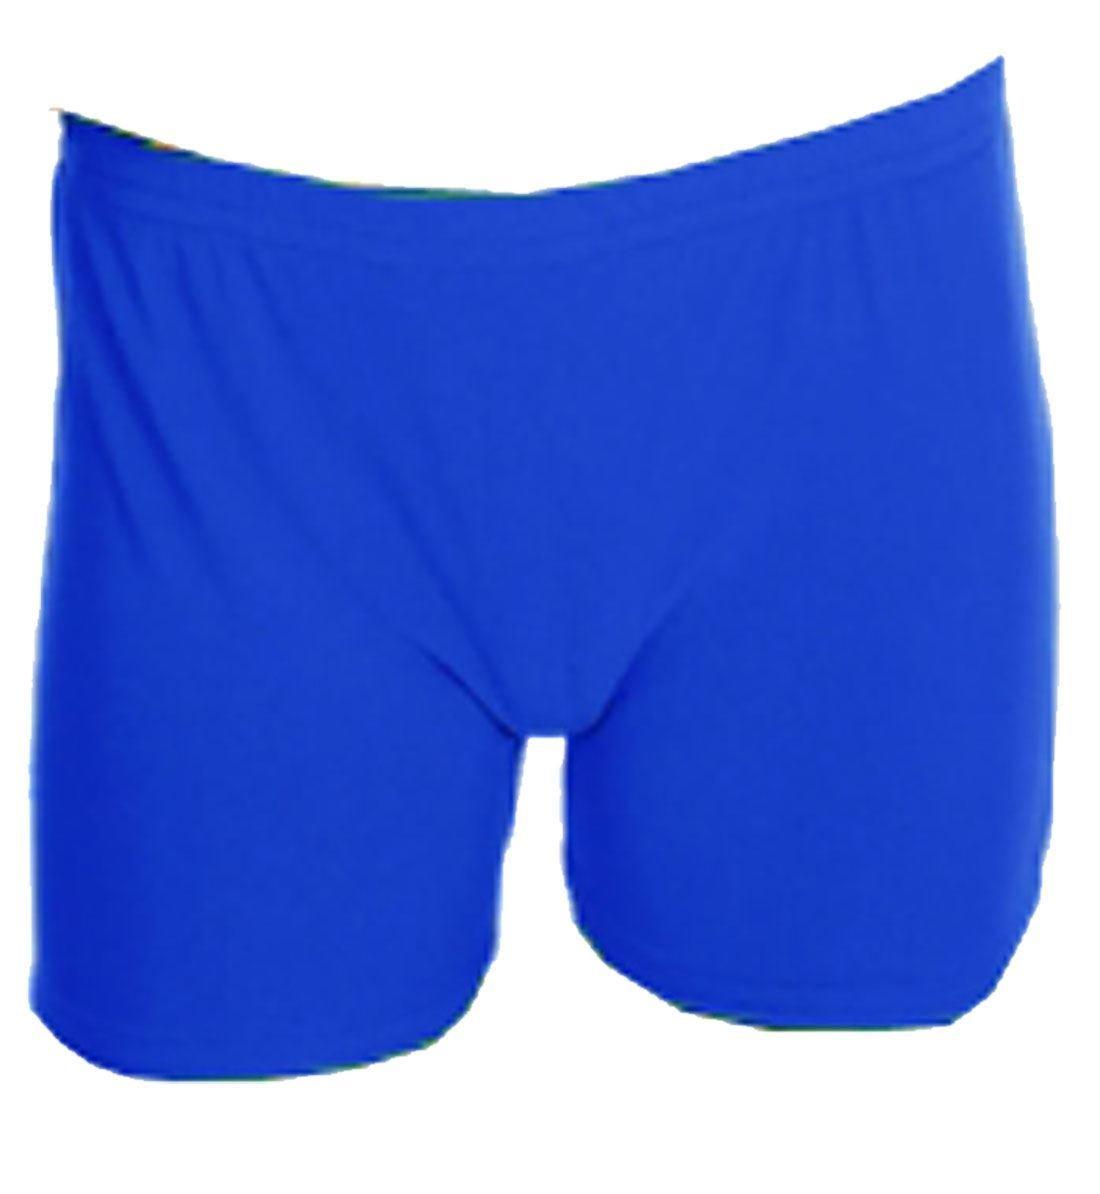 Rimi Hanger Children Plain Stretchy Neon Hot Pants Girls Dance Gym Lycra Party Tutu Shorts Royal Blue 5-6 Years